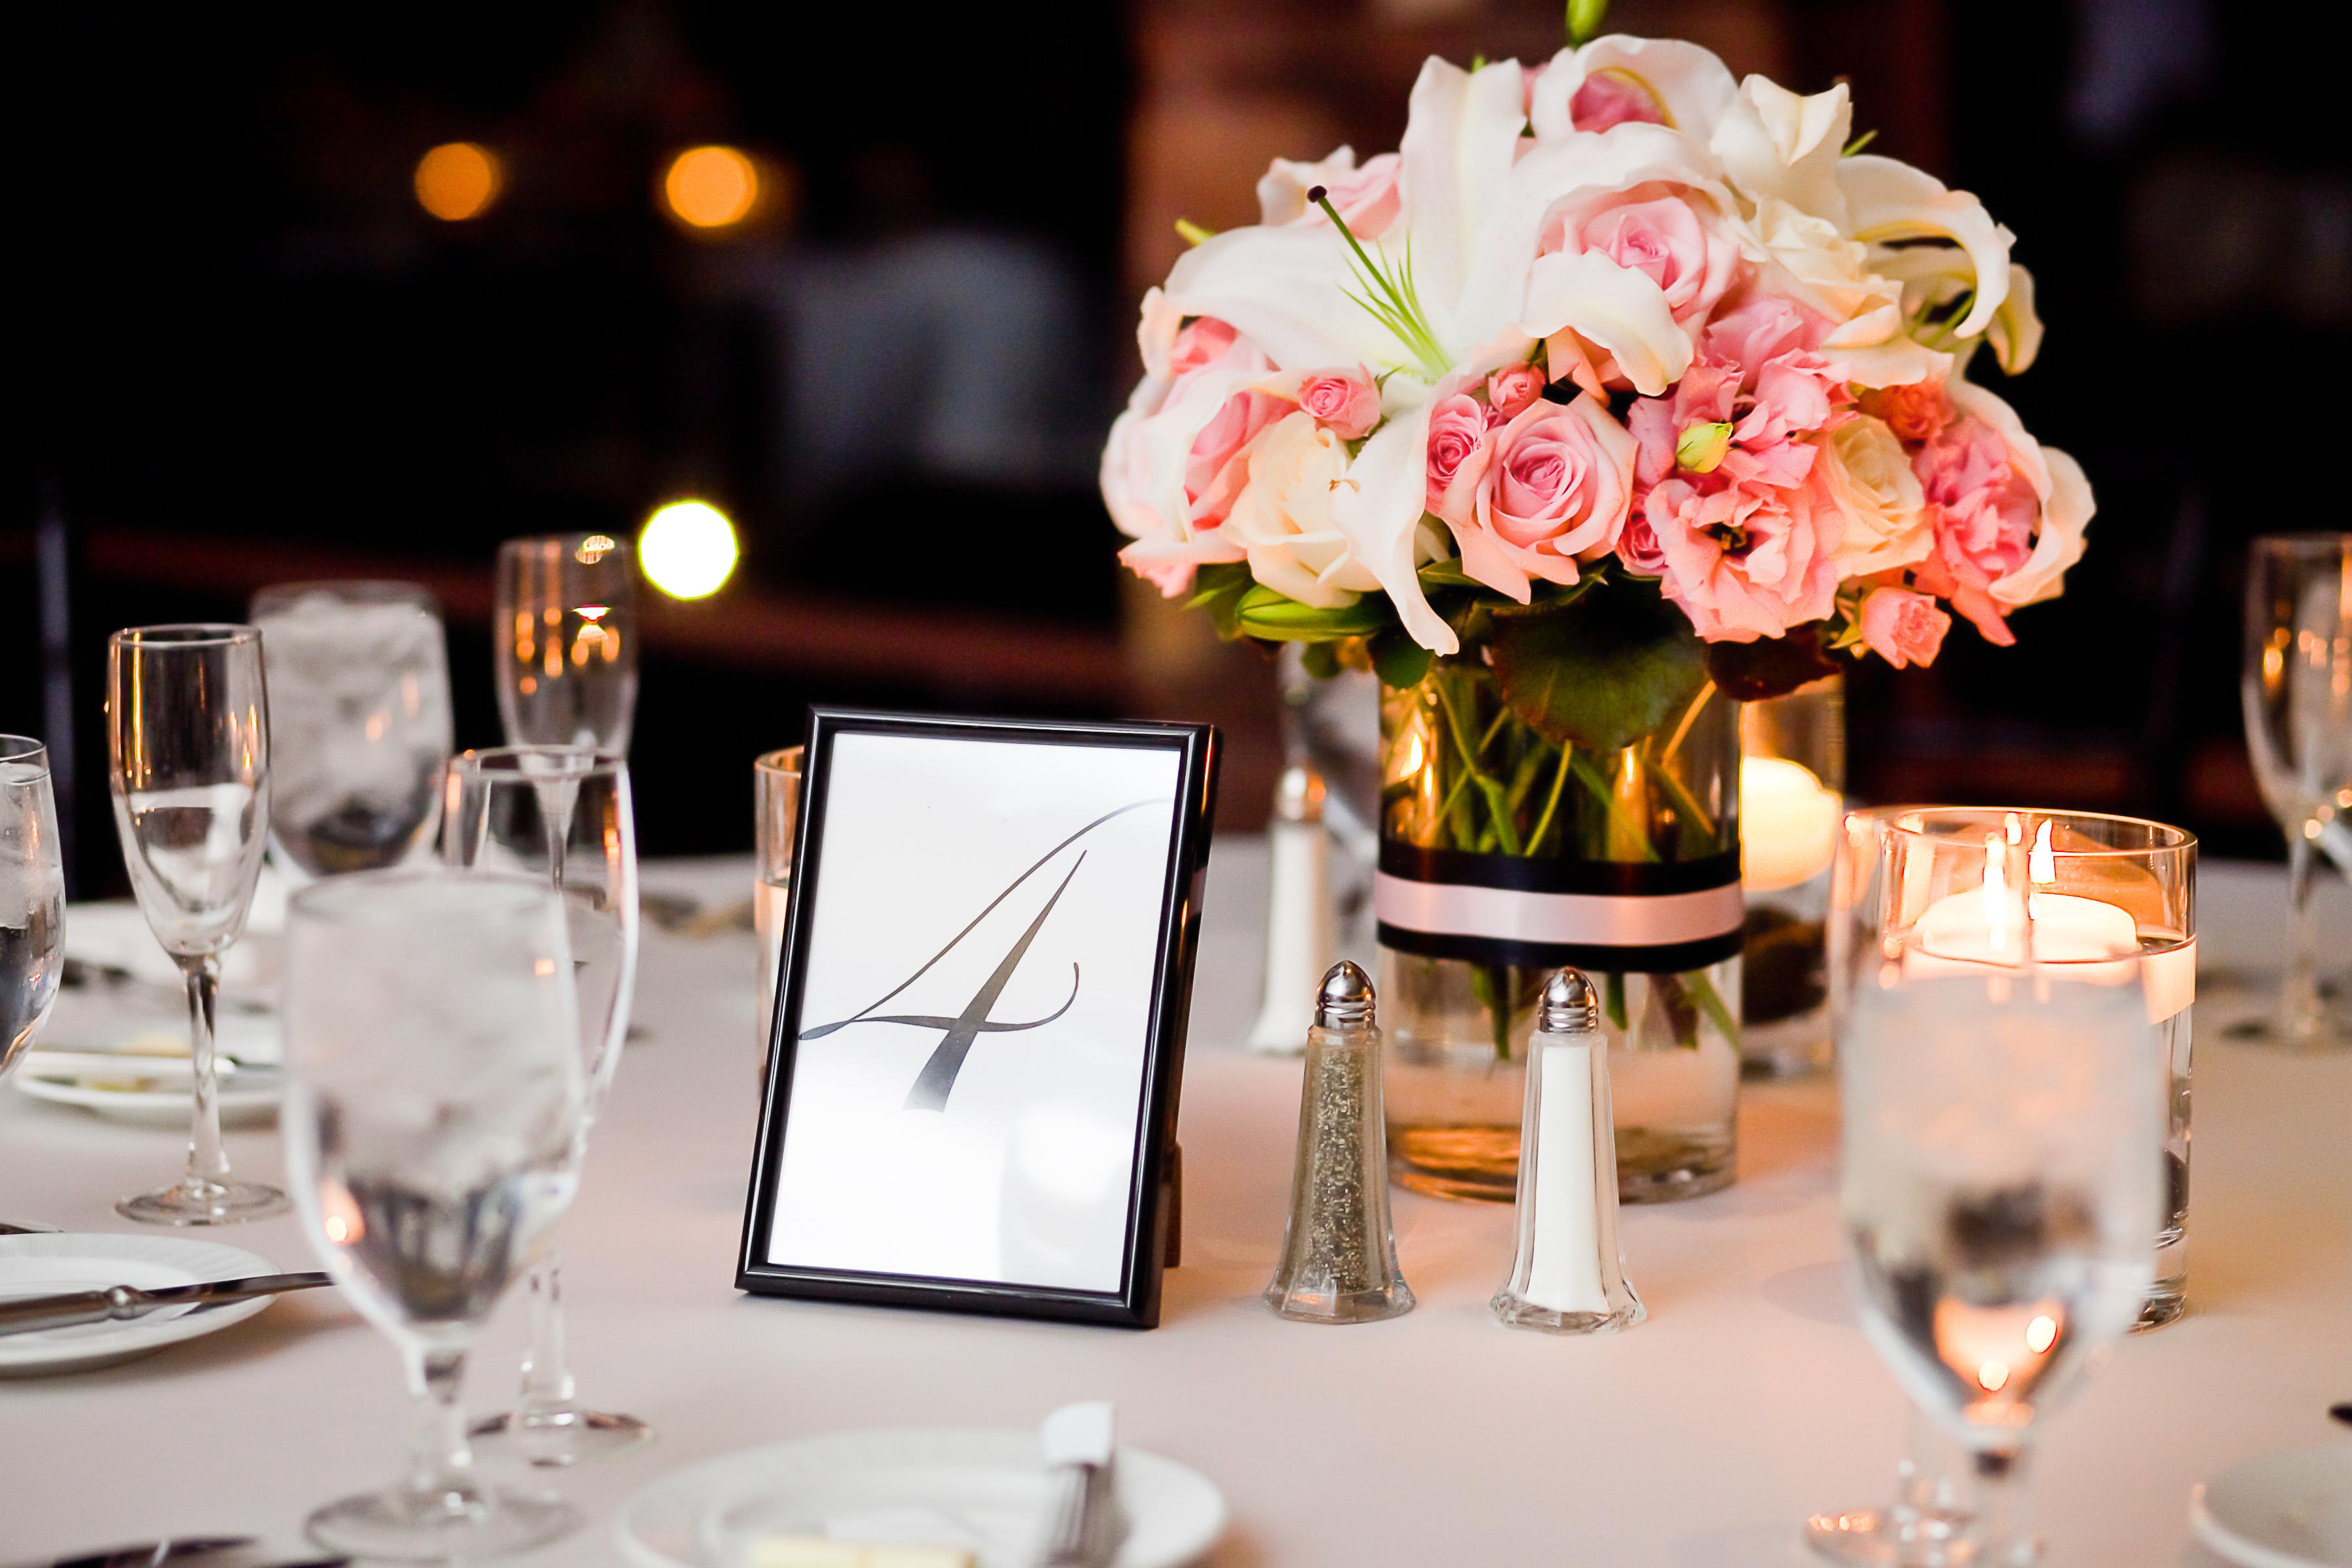 Wedding table centerpiece at Vouv in dallas texas